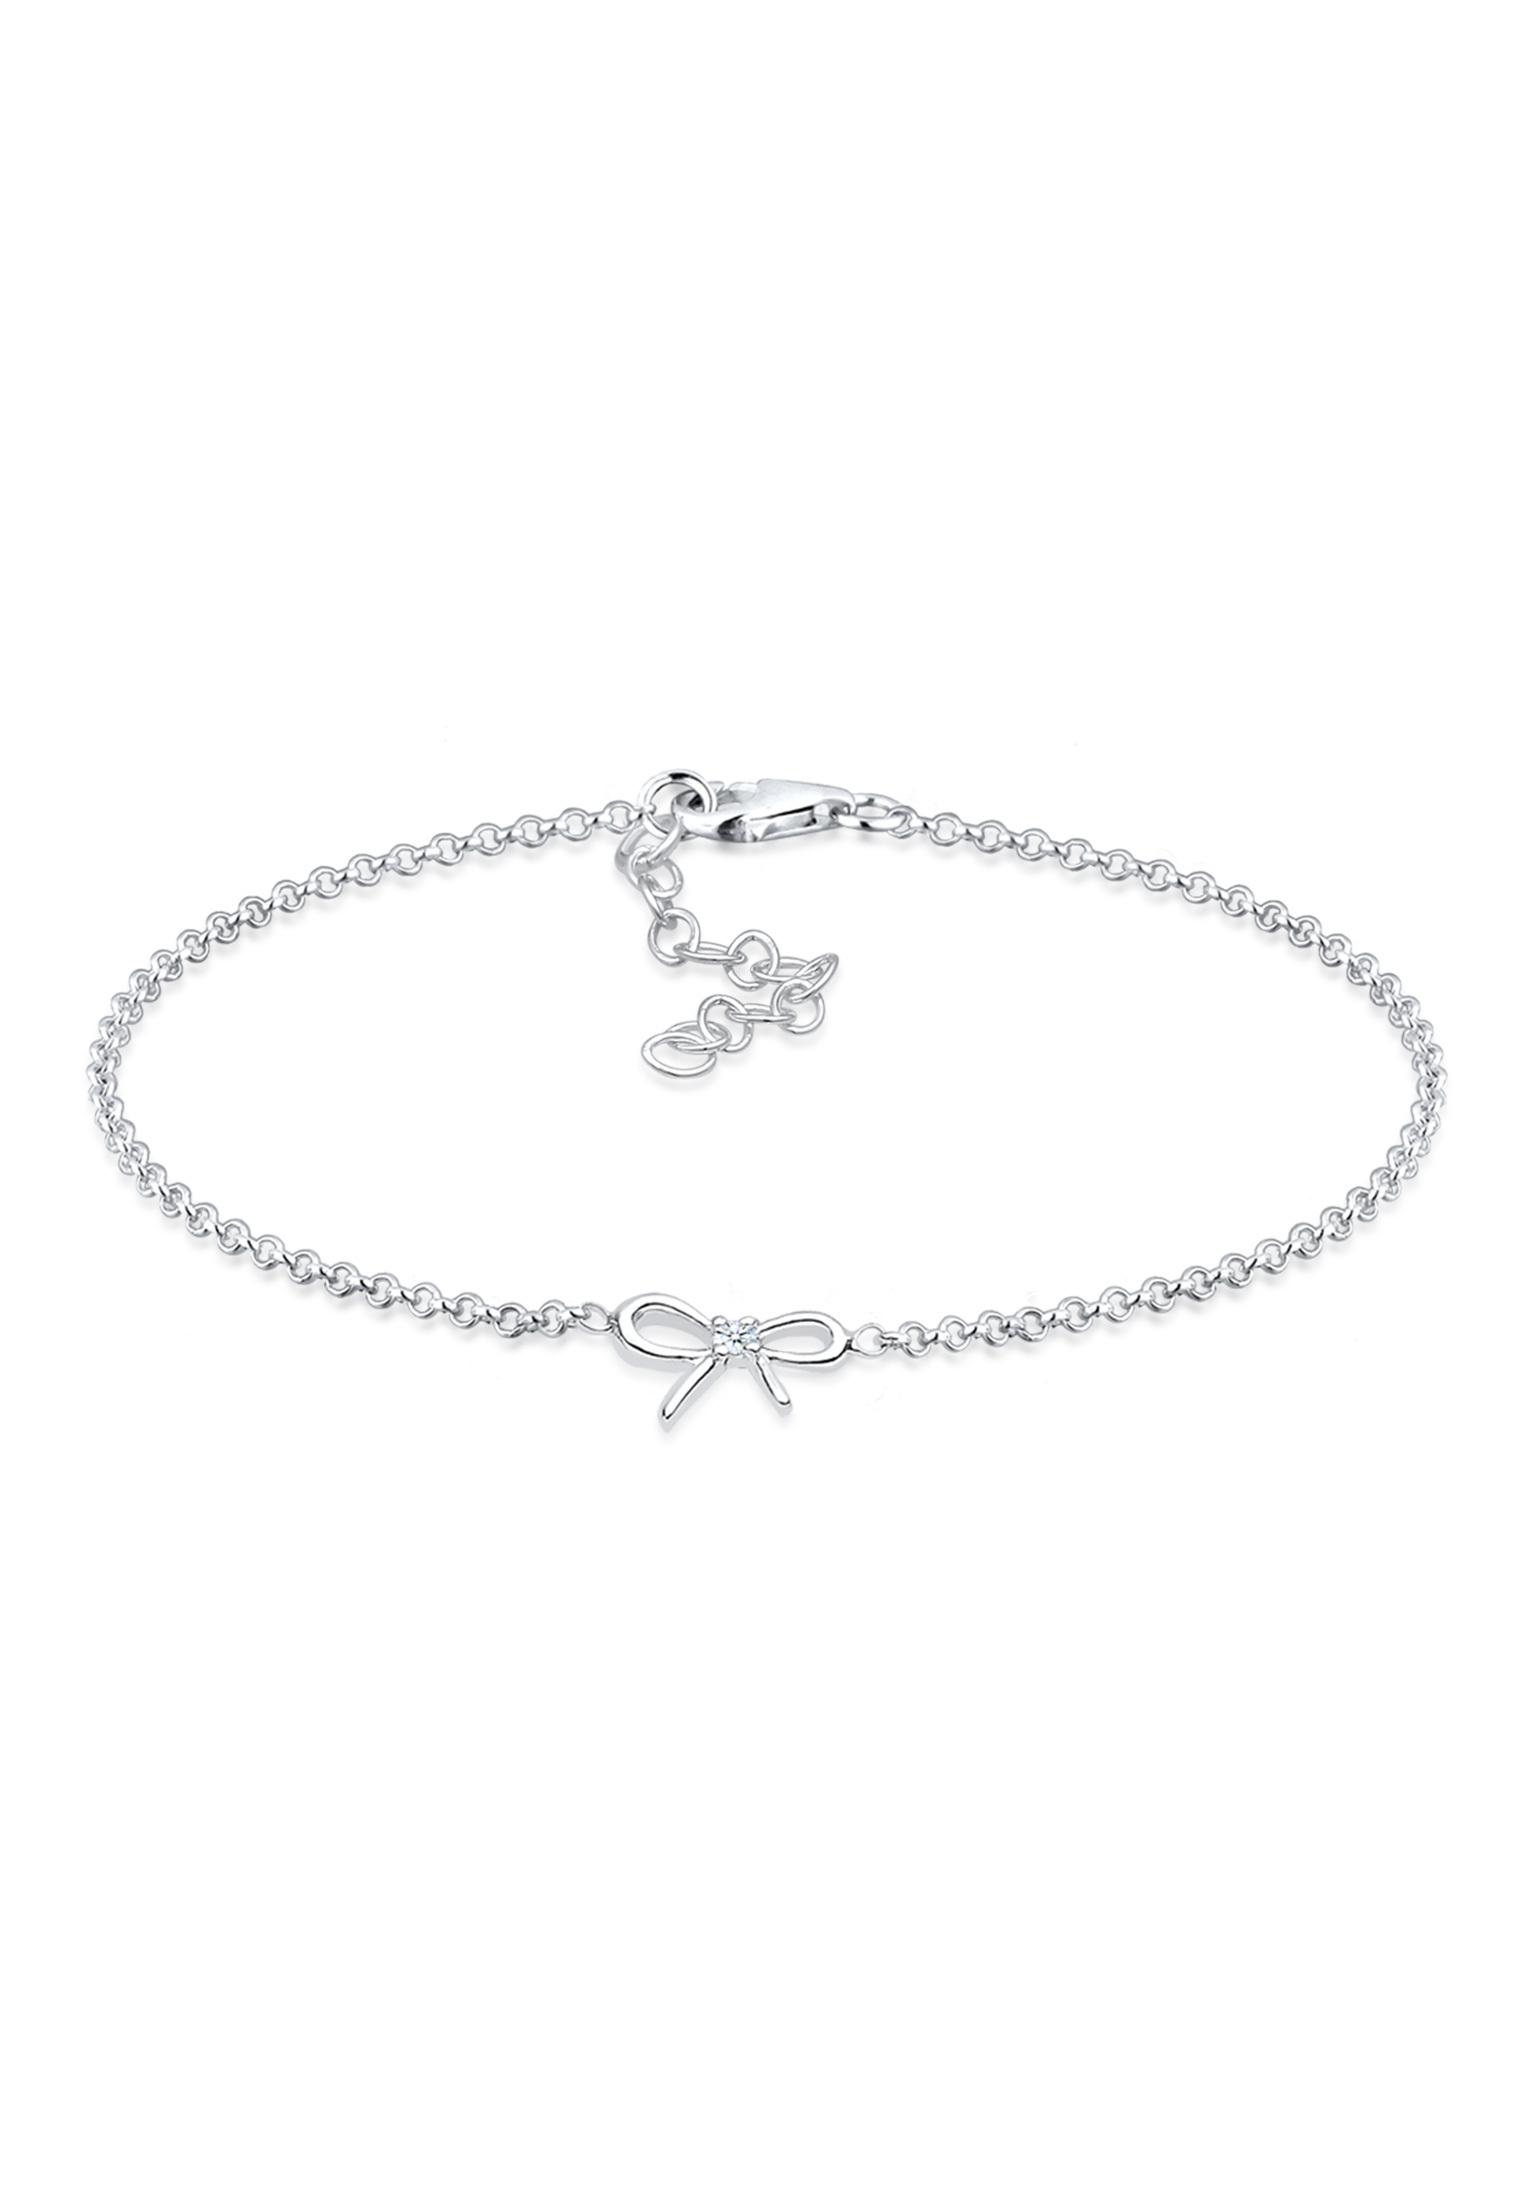 Armband Schleife | Diamant ( Weiß, 0,015 ct ) | 925er Sterling Silber